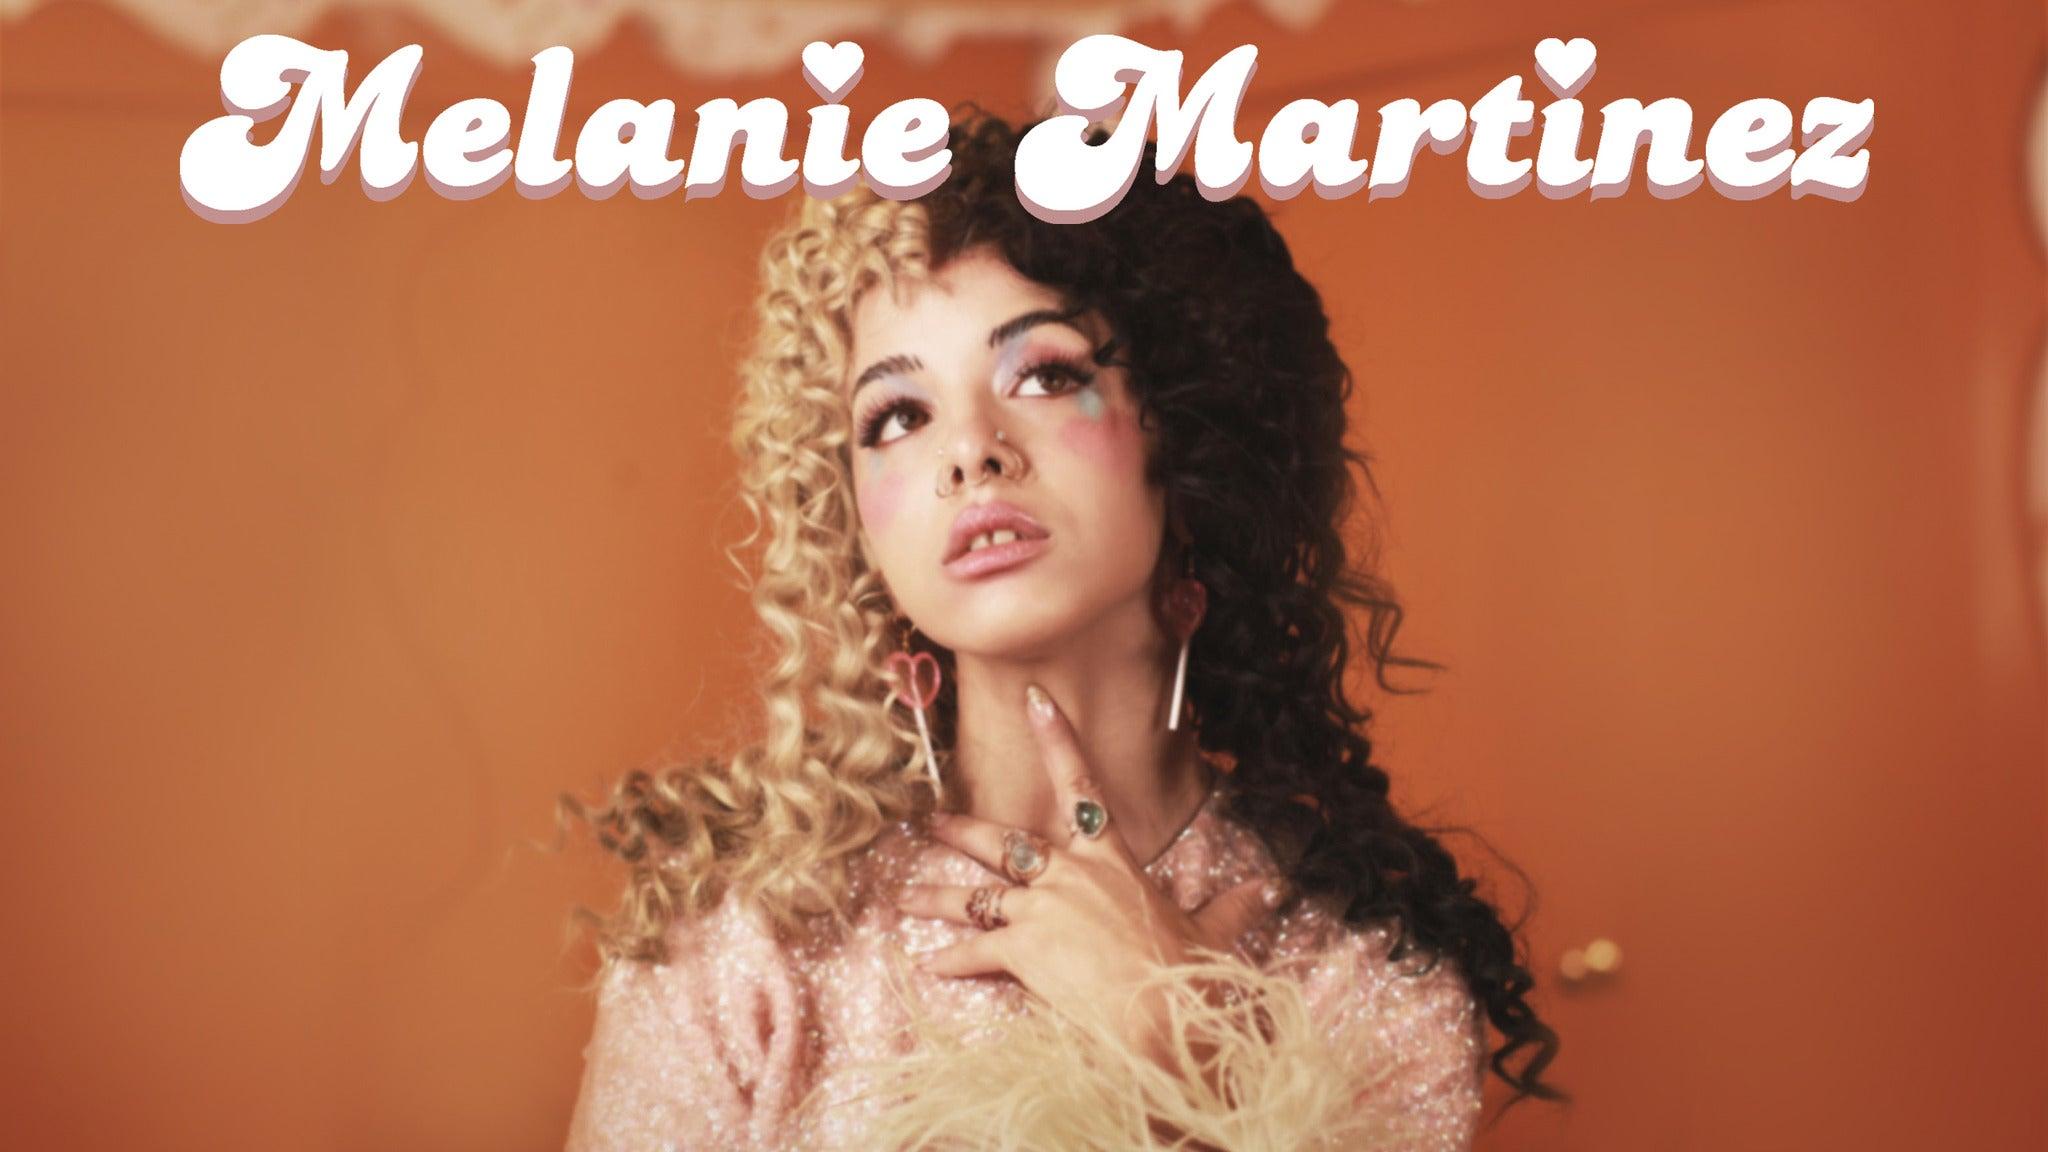 Melanie Martinez: The K-12 Tour at The Union Event Center